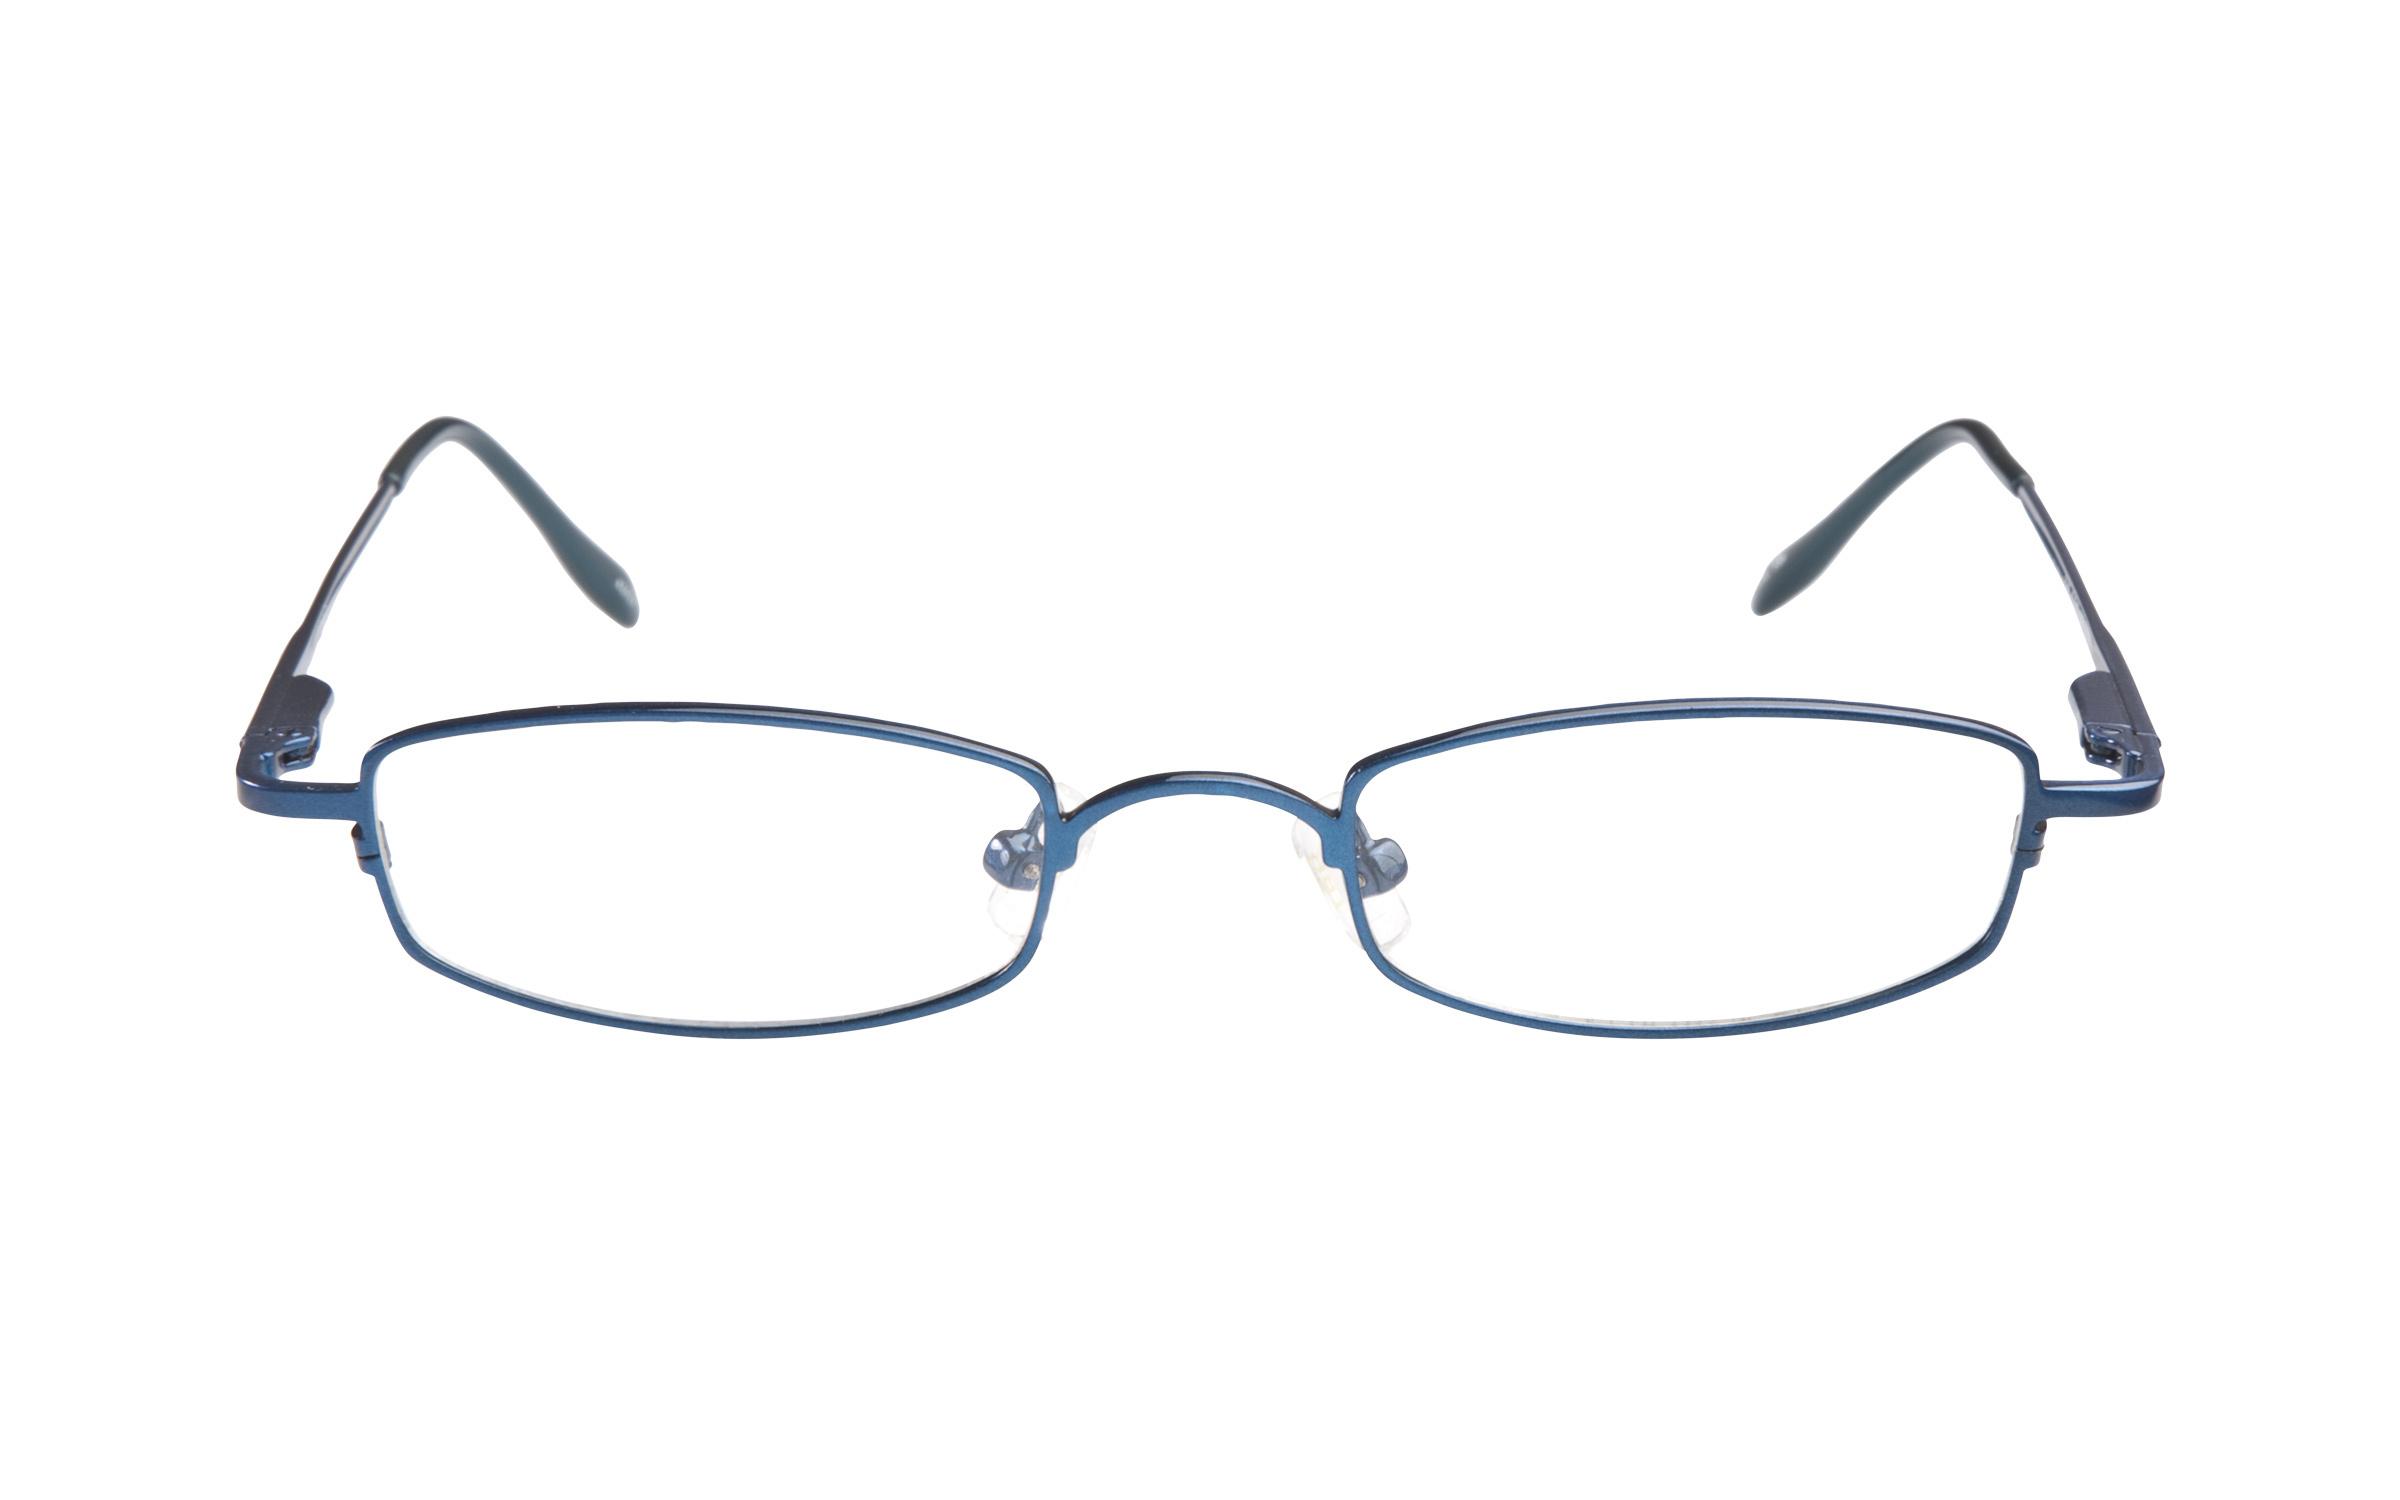 OGI_2149_536_Eyeglasses_and_Frame_in_Royal_Blue_|_AcetateMetal__Online_Coastal